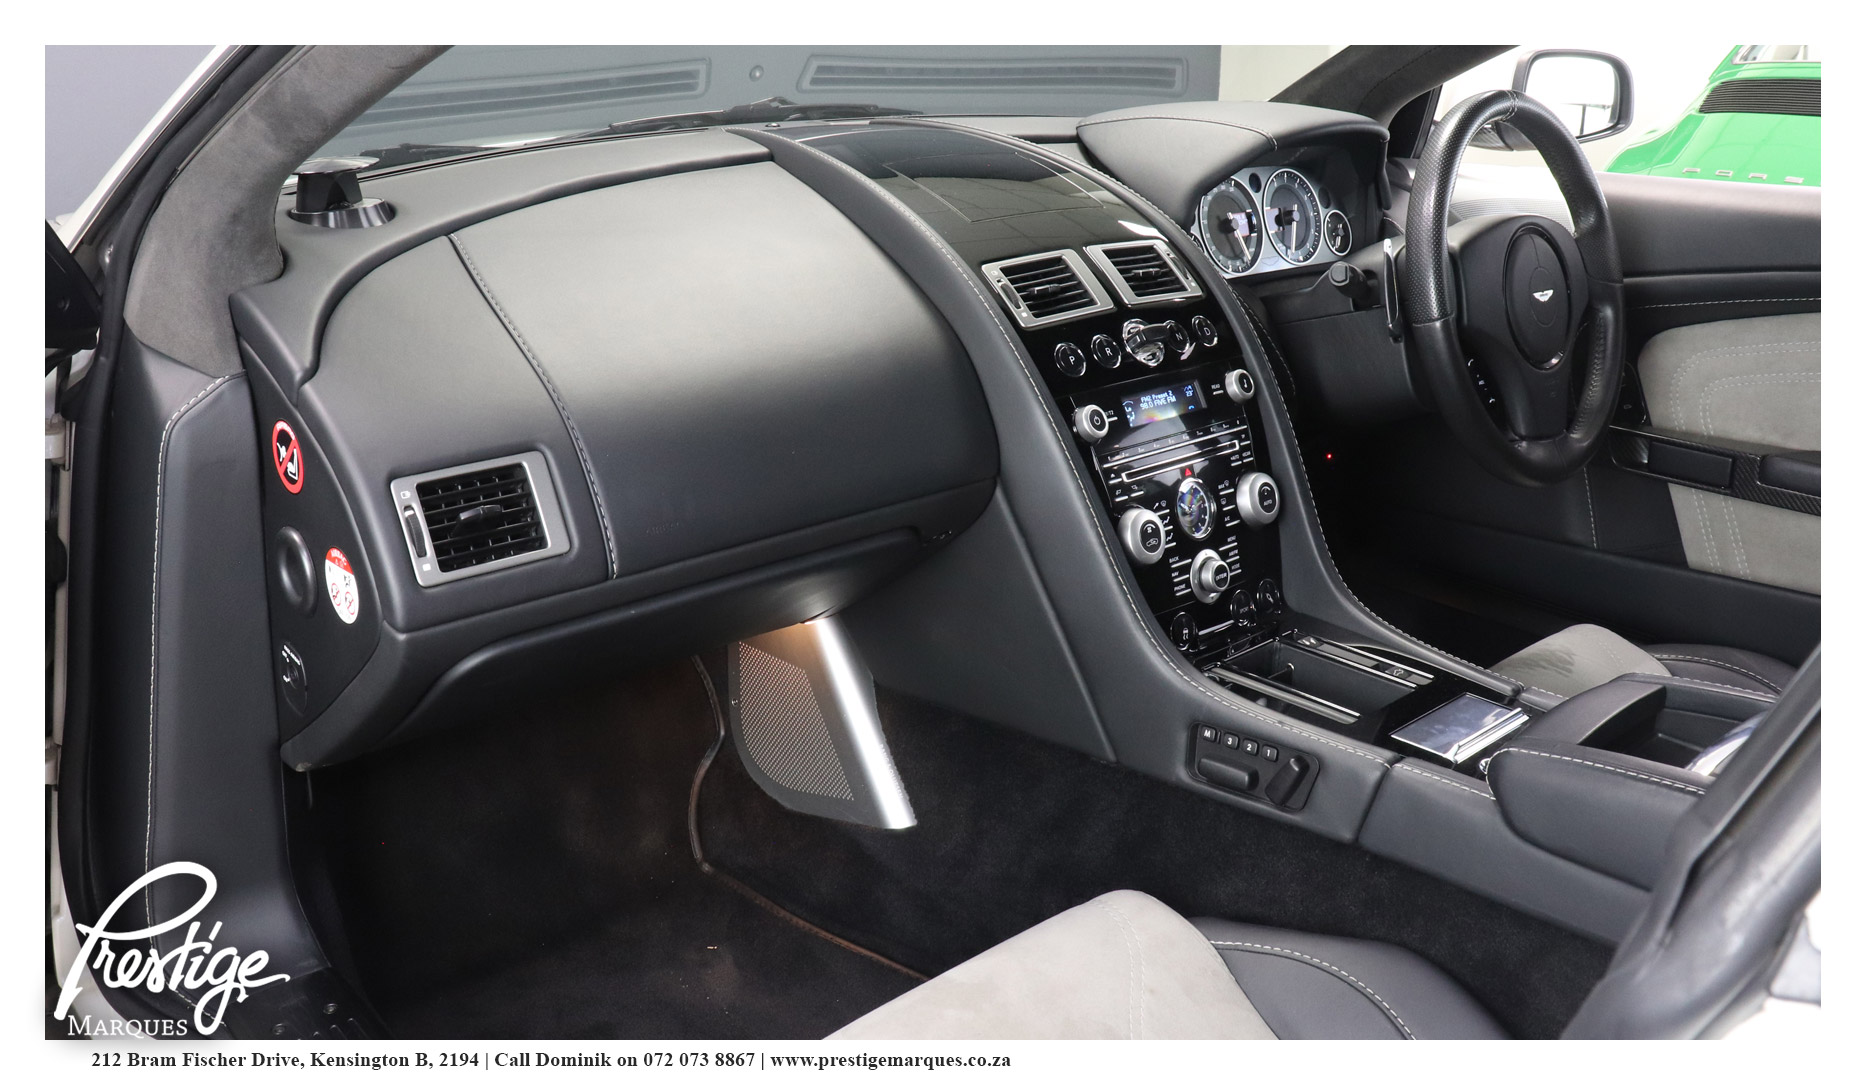 Aston-Martin-DBS-Coupe-Auto-2009-Prestige-Marques-Randburg-Sandton-14